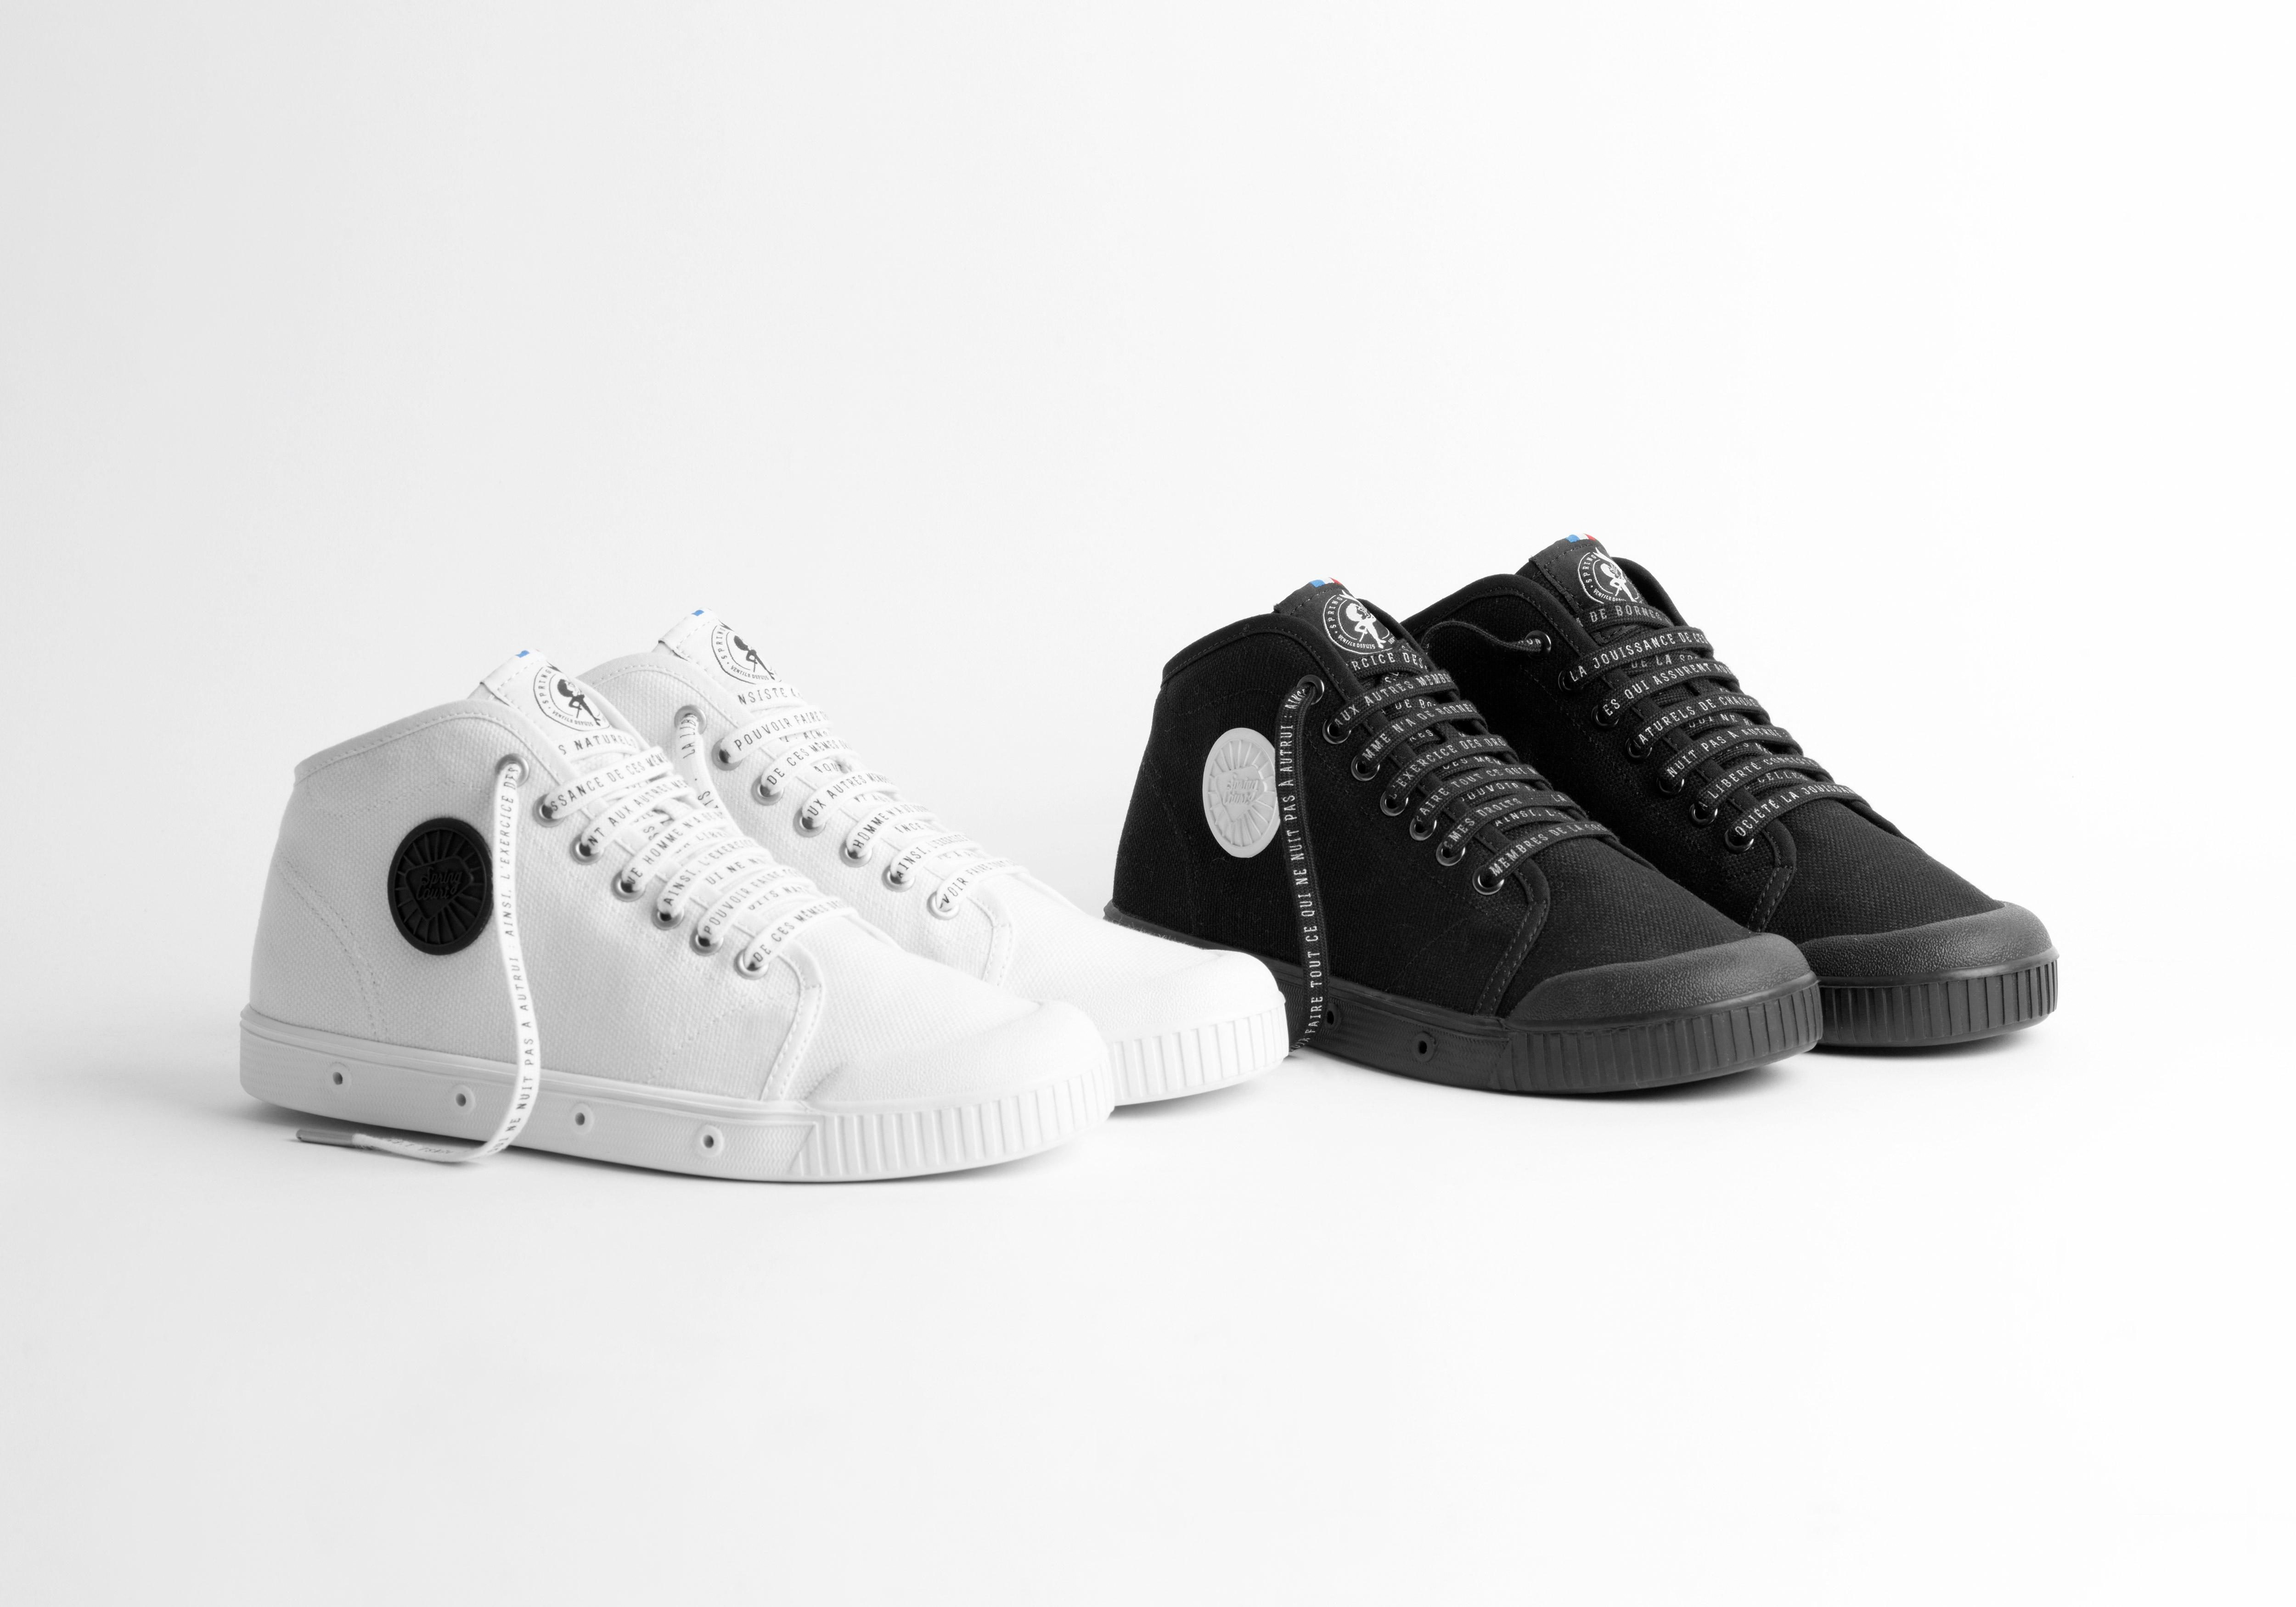 B2 Liberté black and white